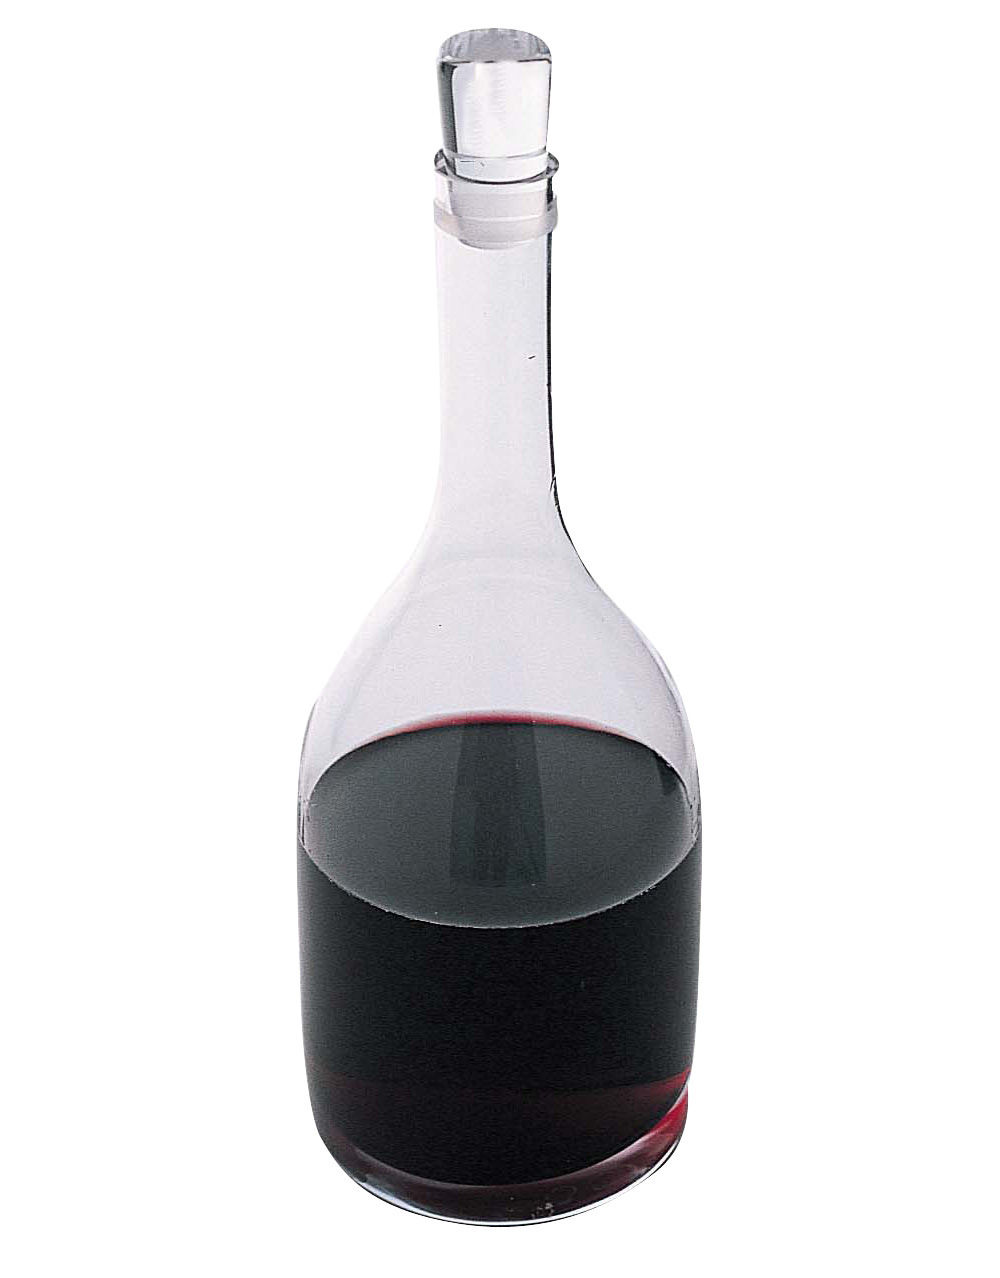 Tavola - Caraffe e Decantatori - Caraffa Vieux millésime di L'Atelier du Vin - Trasparente - Vetro soffiato a bocca